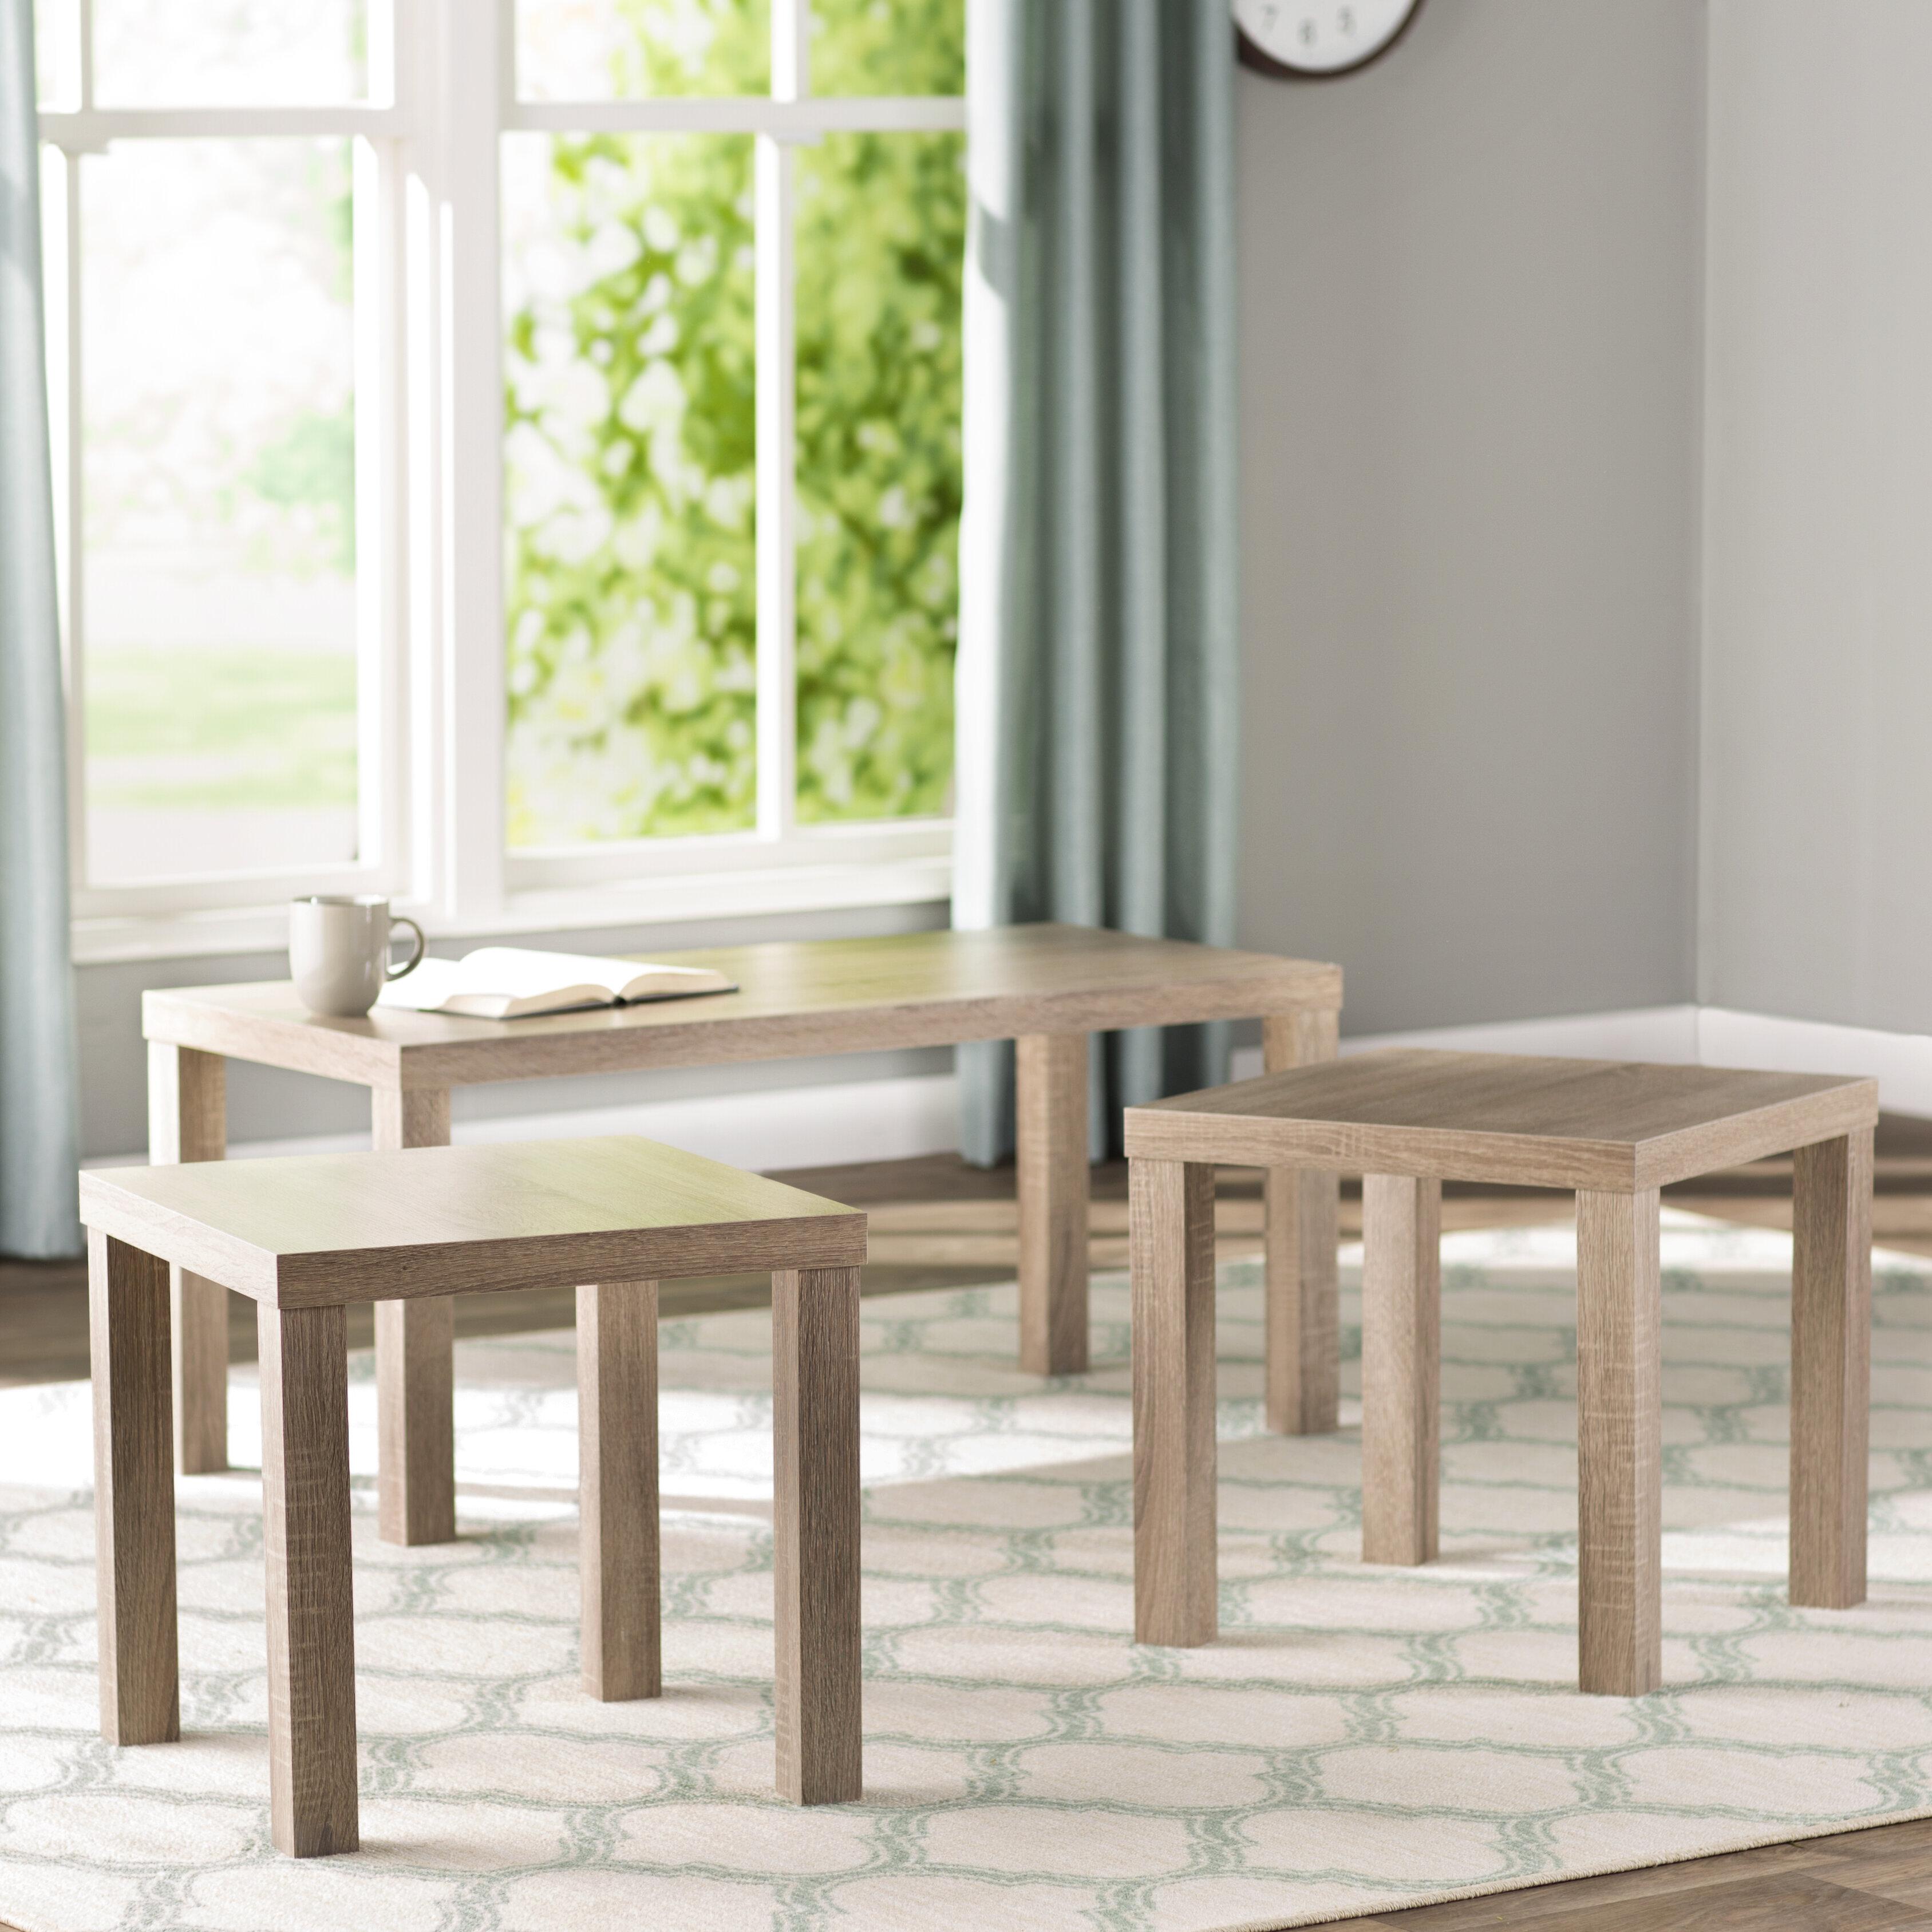 Beachcrest Home Sunbury 3 Piece Coffee Table Set & Reviews